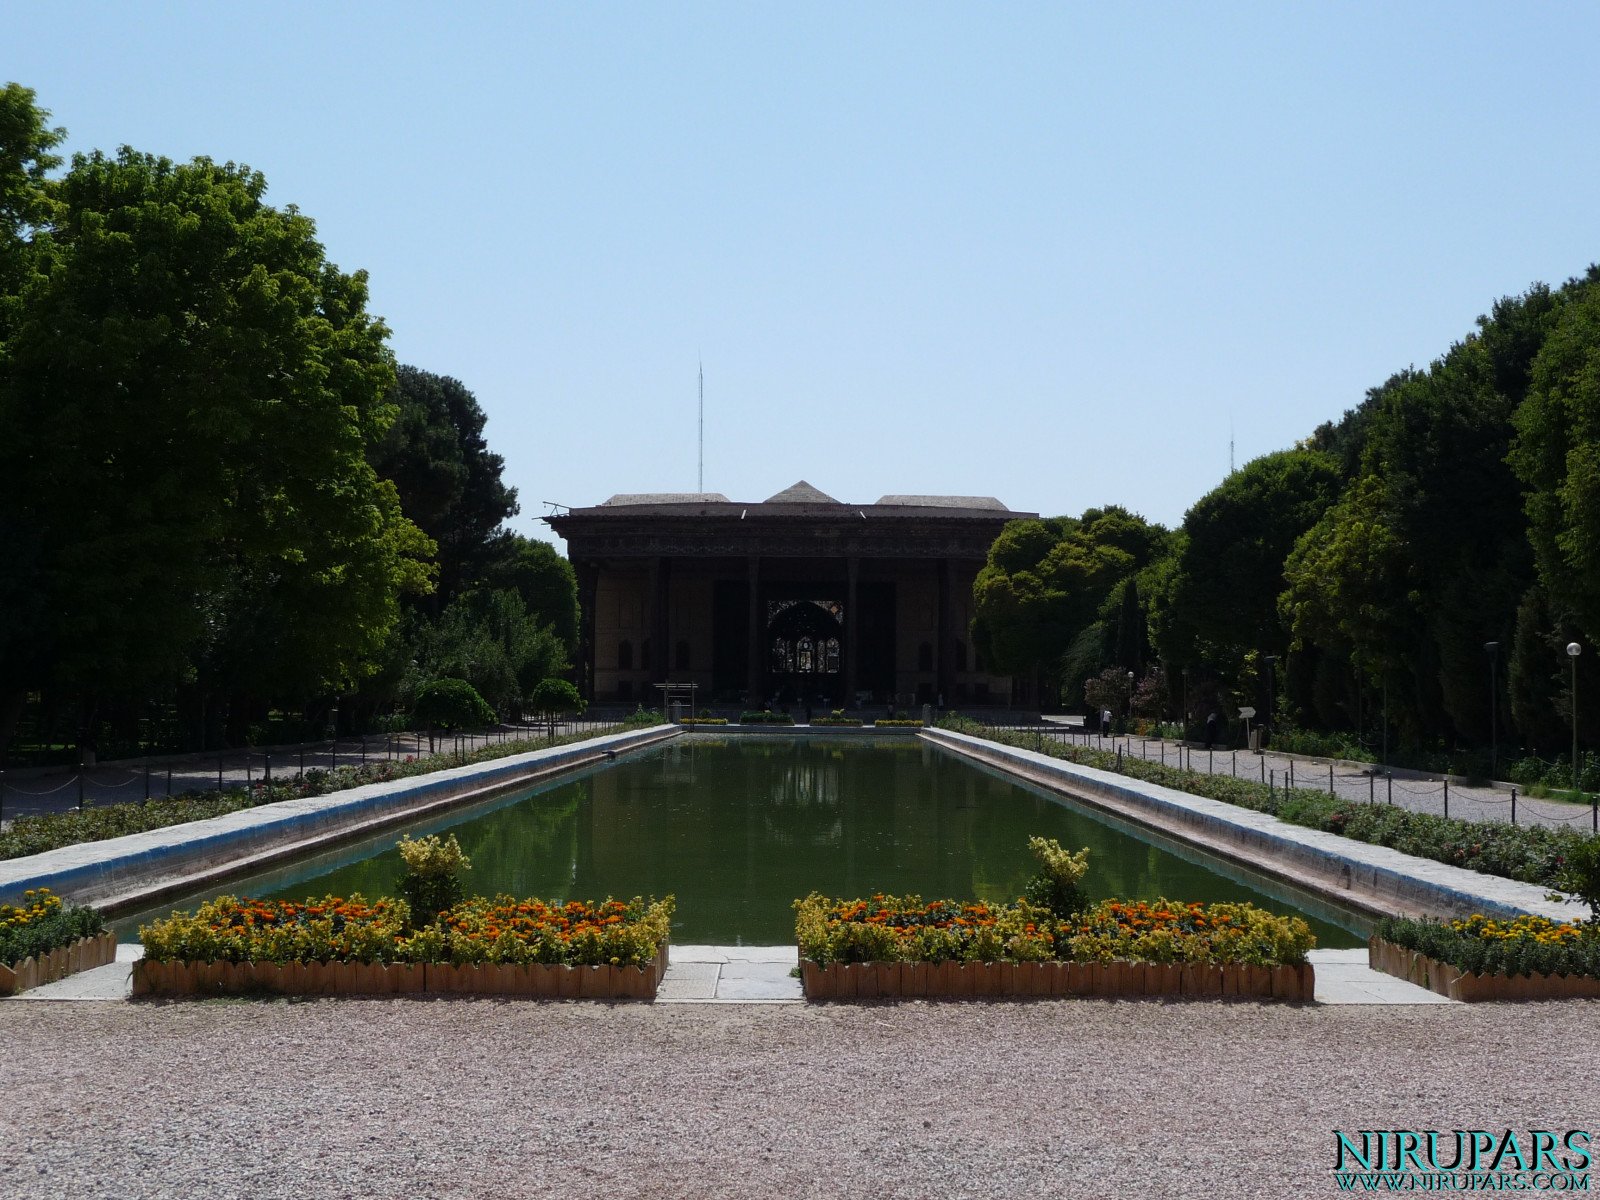 Chehel Sotun - Palace and Garden